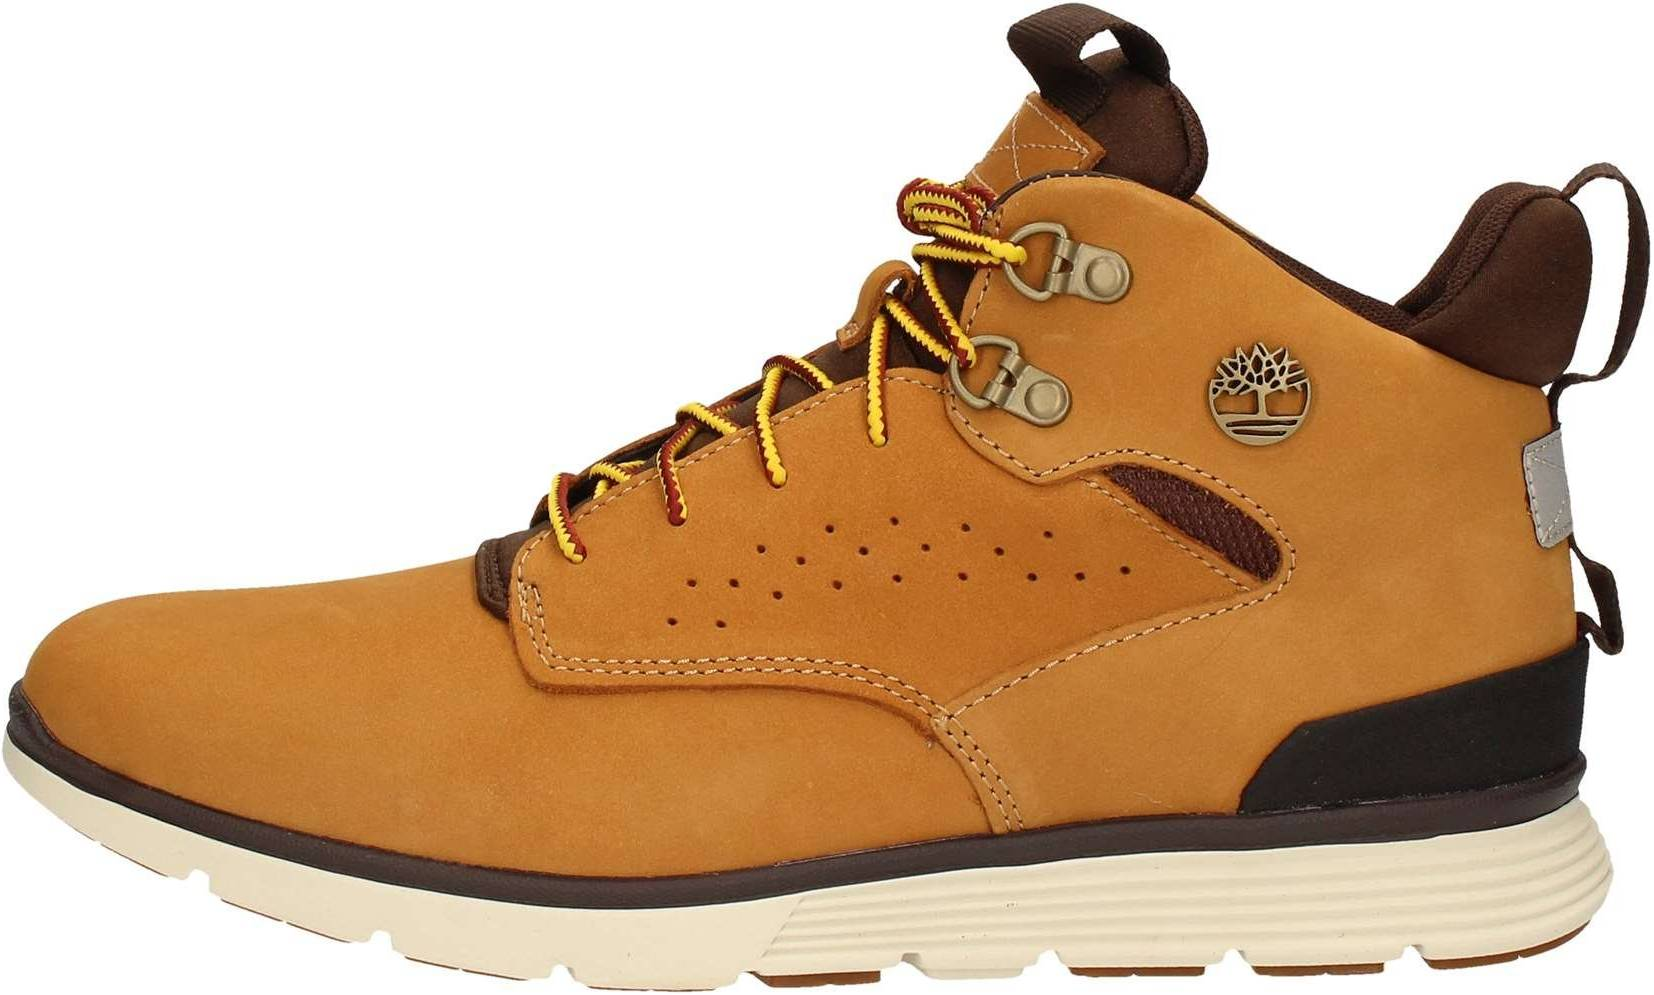 compensación Noticias Moral  Timberland Killington Hiker Chukka Boots sneakers in grey (only $120) |  RunRepeat